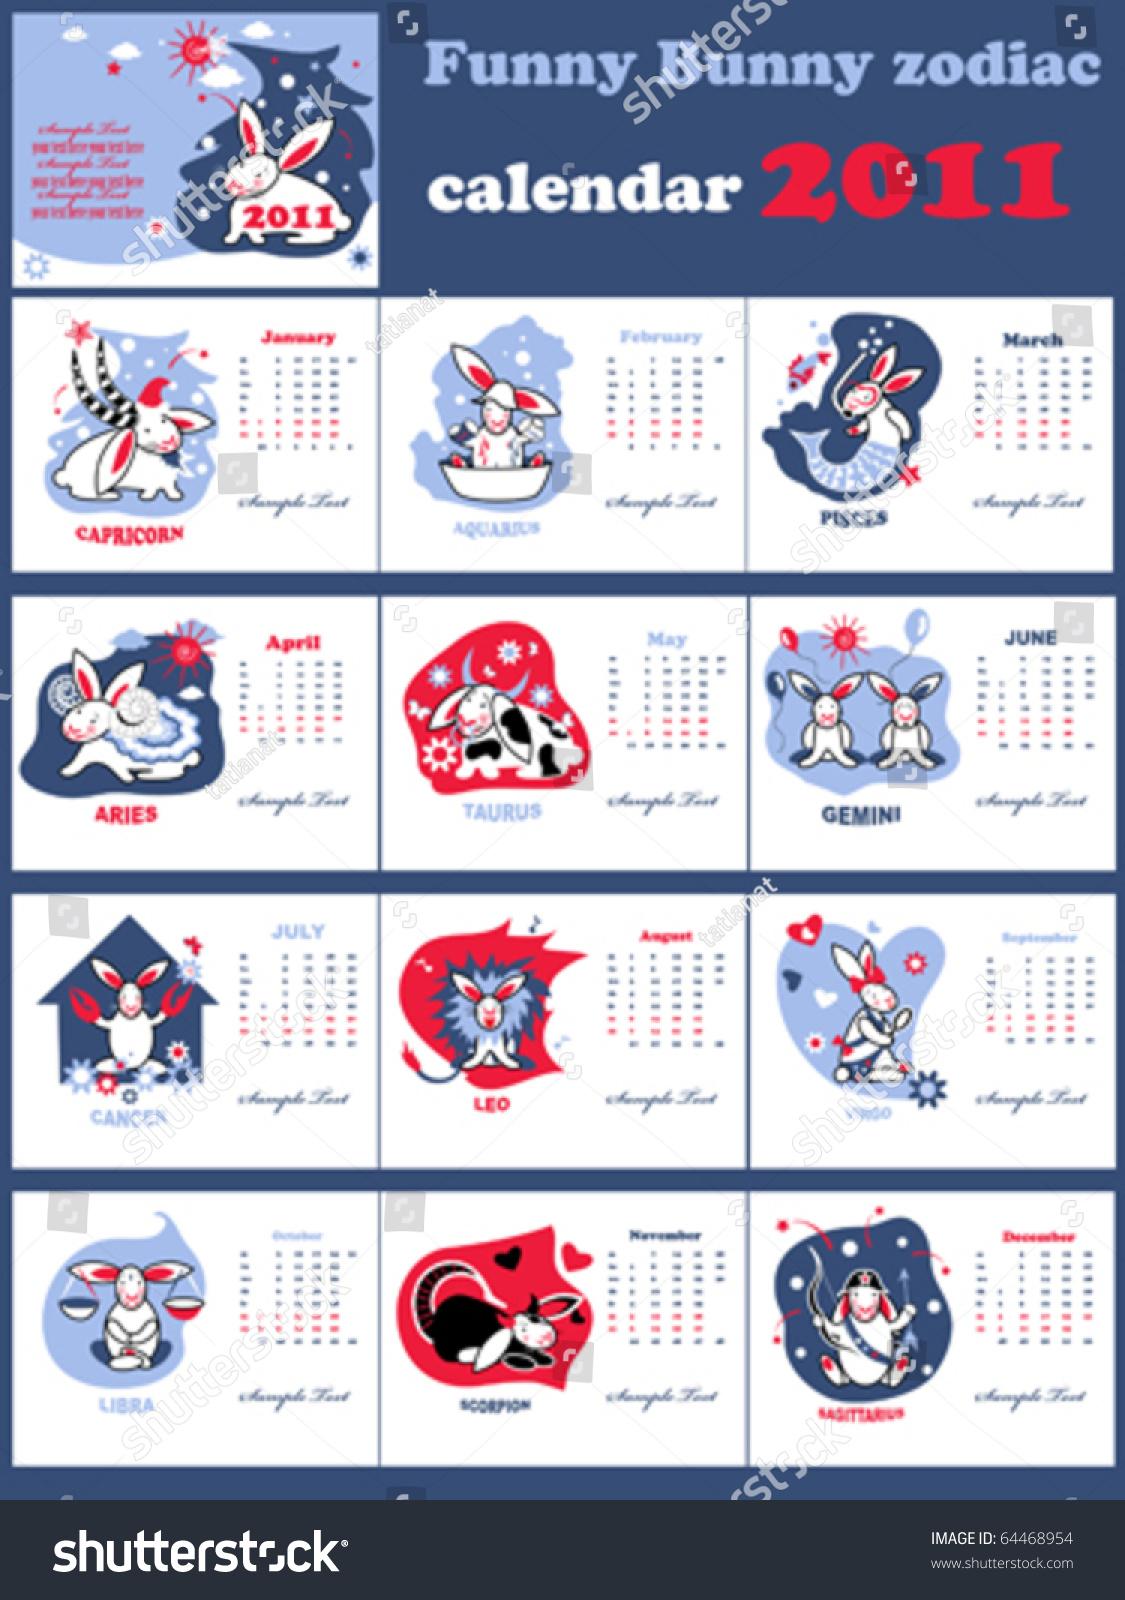 Monthly Calendar Horoscope : Funny bunny zodiac calendar set stock vector